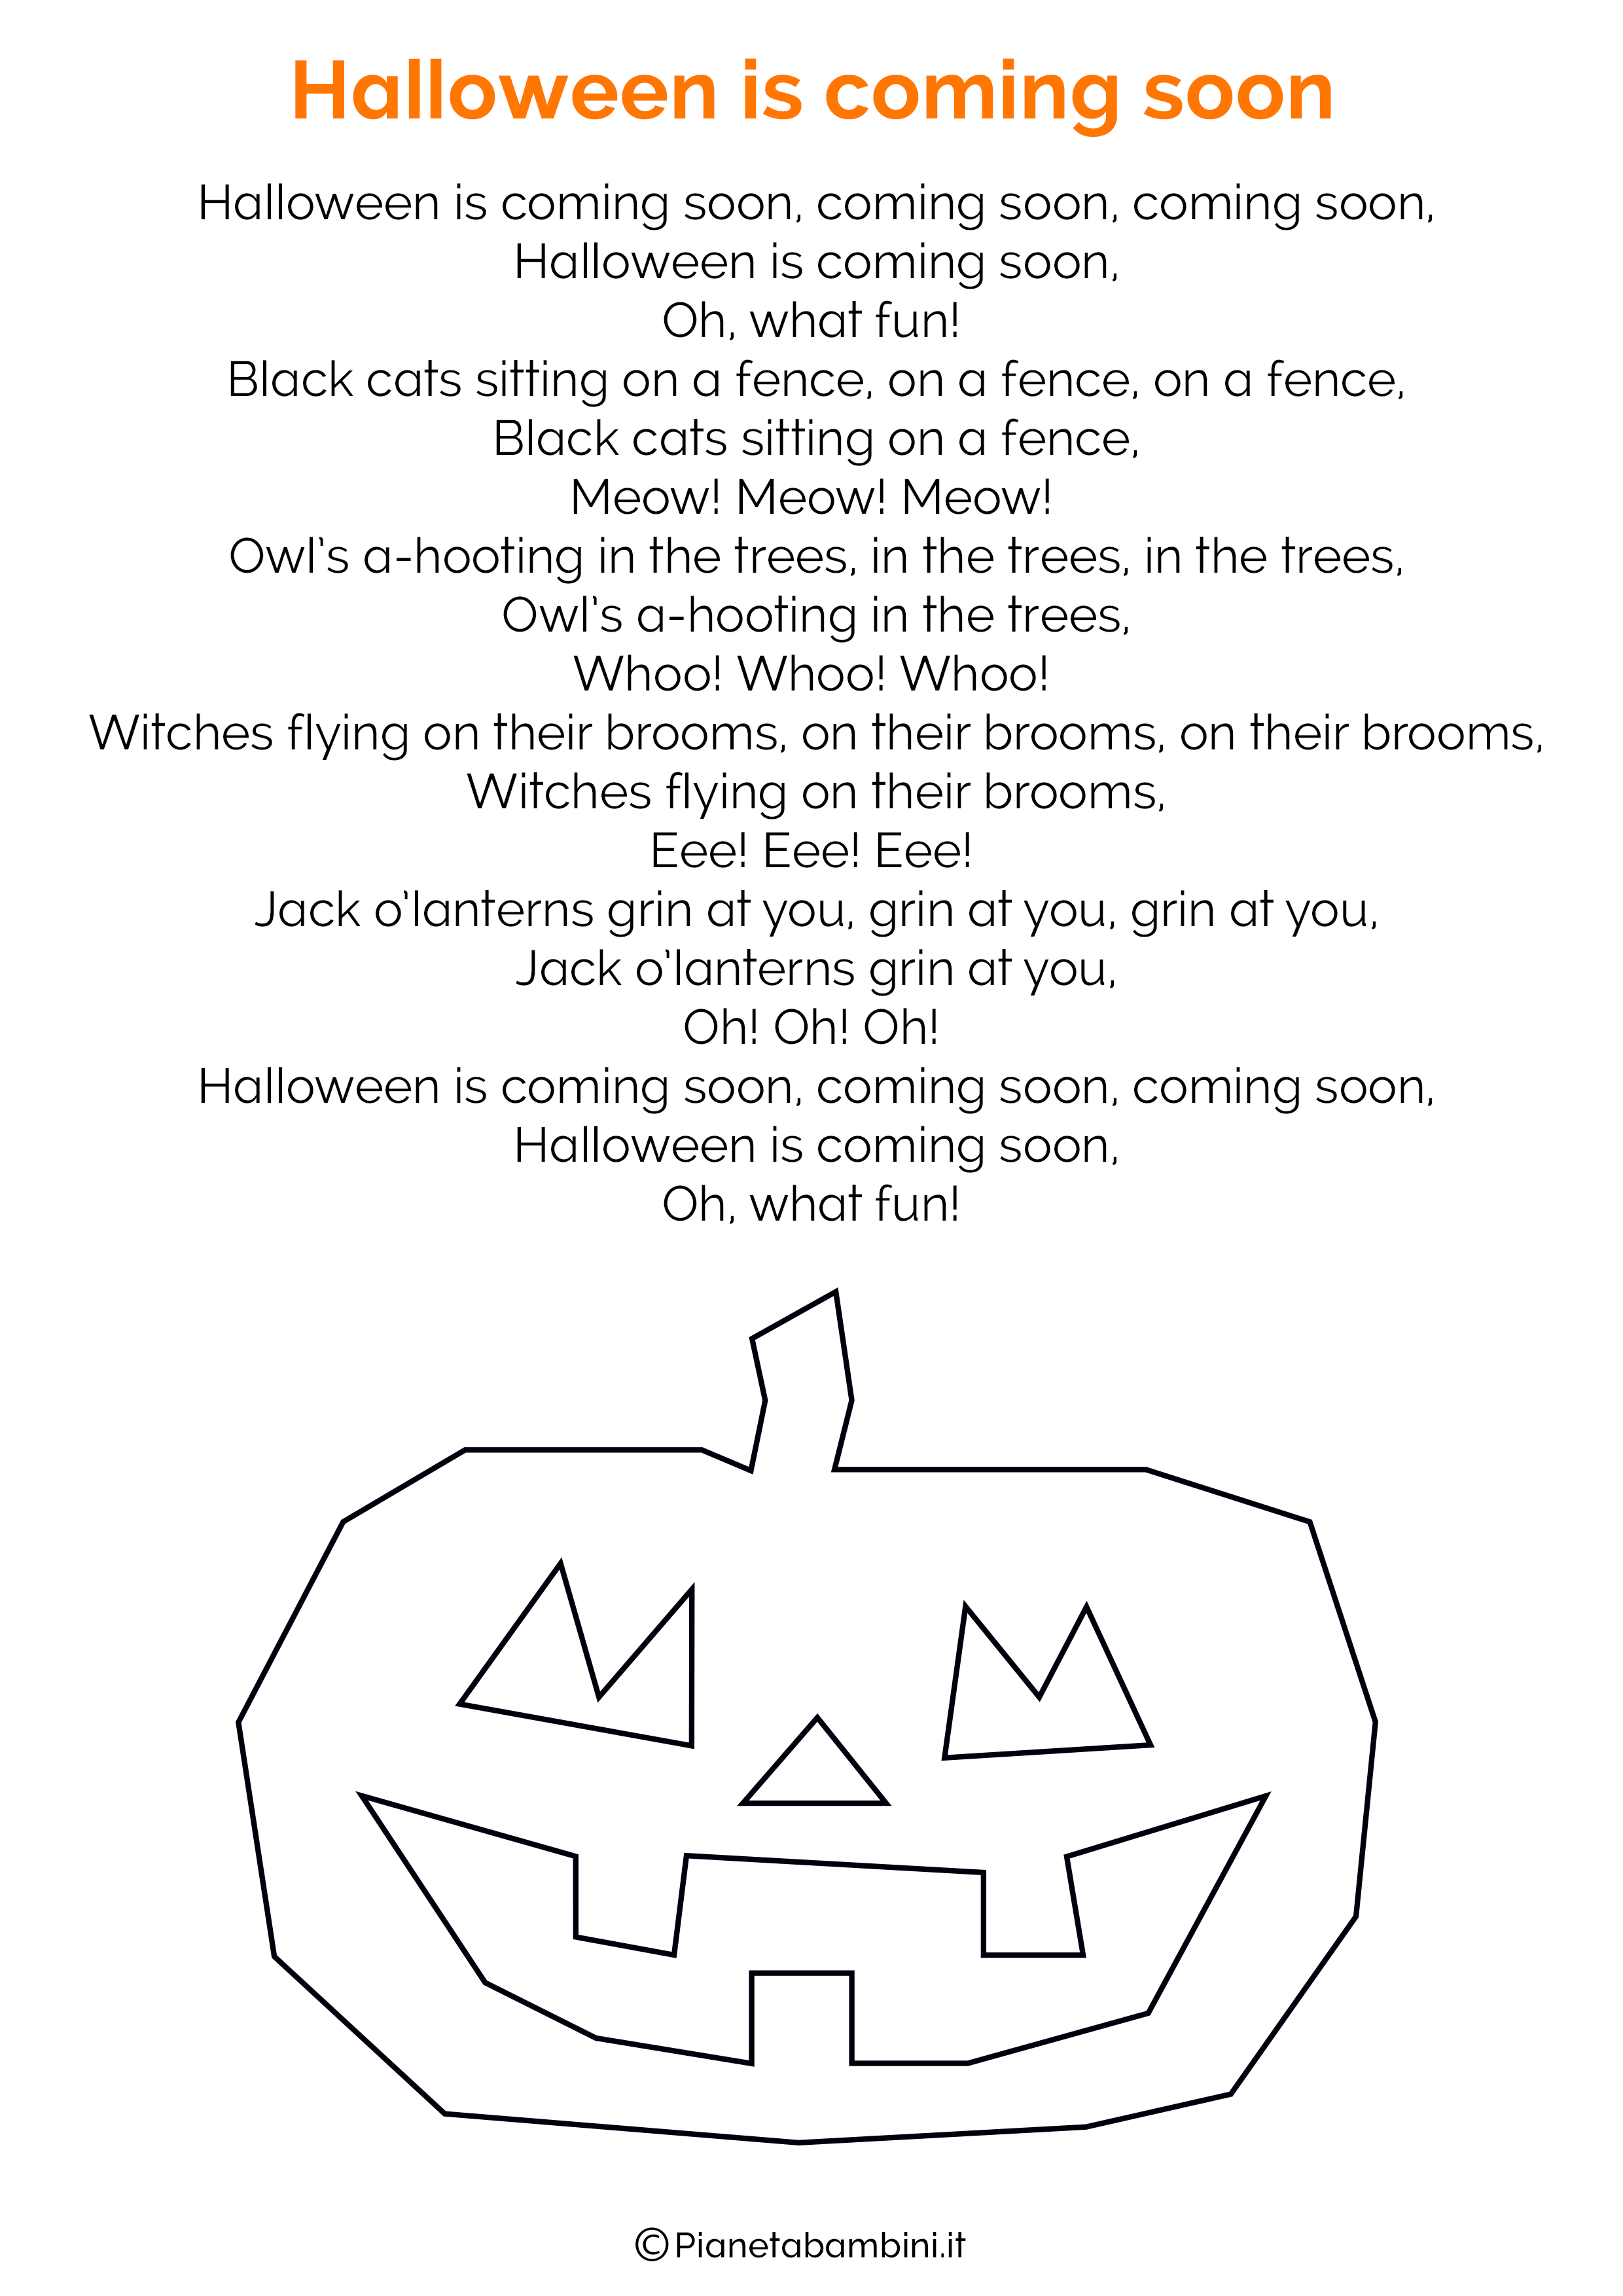 Favoloso 20 Filastrocche di Halloween in Inglese | PianetaBambini.it FG53